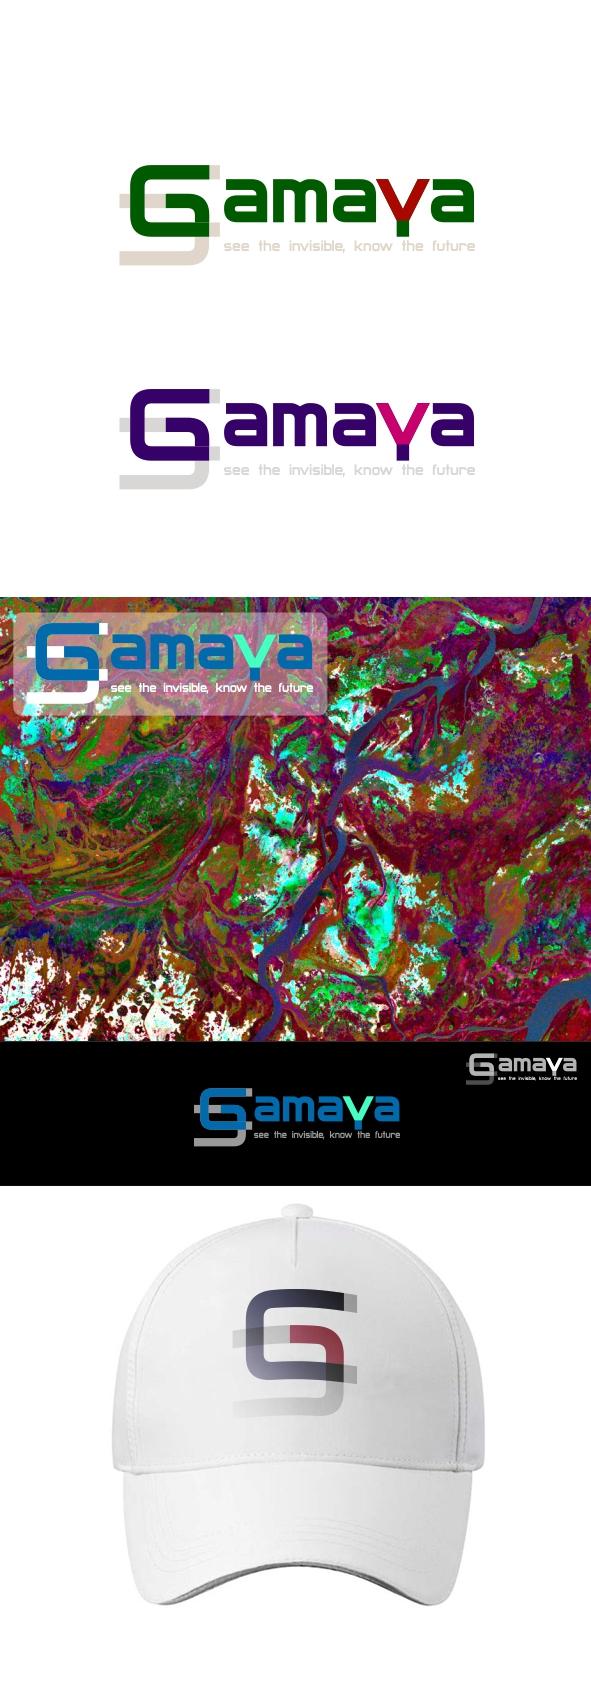 Разработка логотипа для компании Gamaya фото f_5805485819c7aa6f.jpg